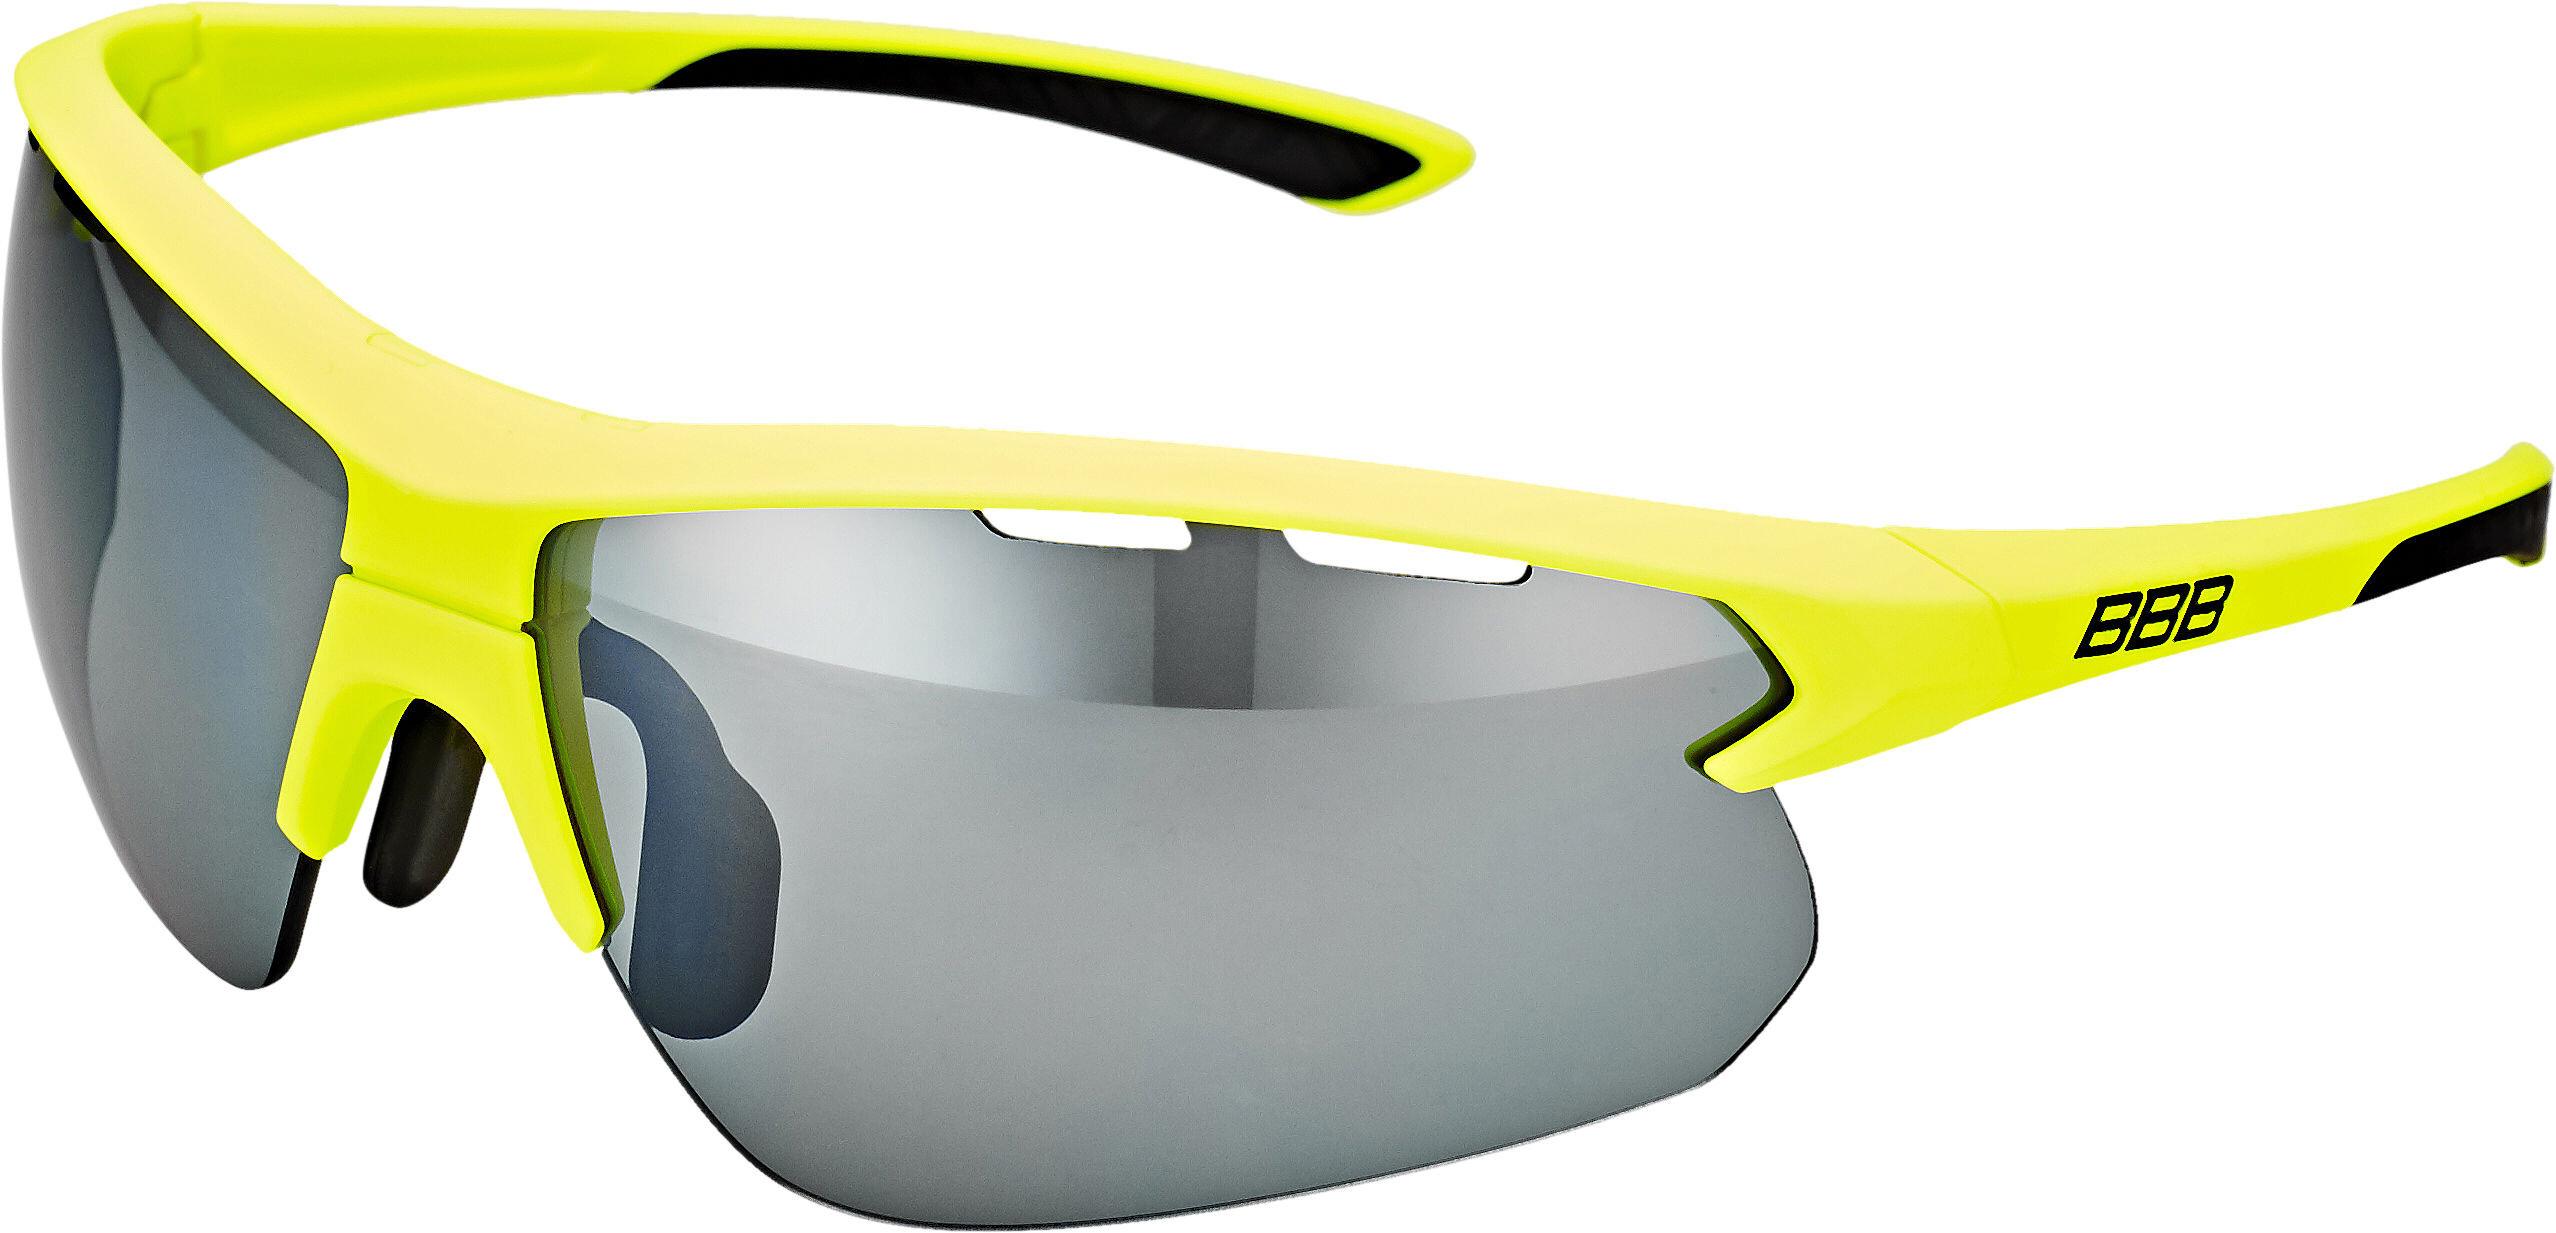 5f6a725b261c BBB Impulse BSG-52 Cykelbriller gul